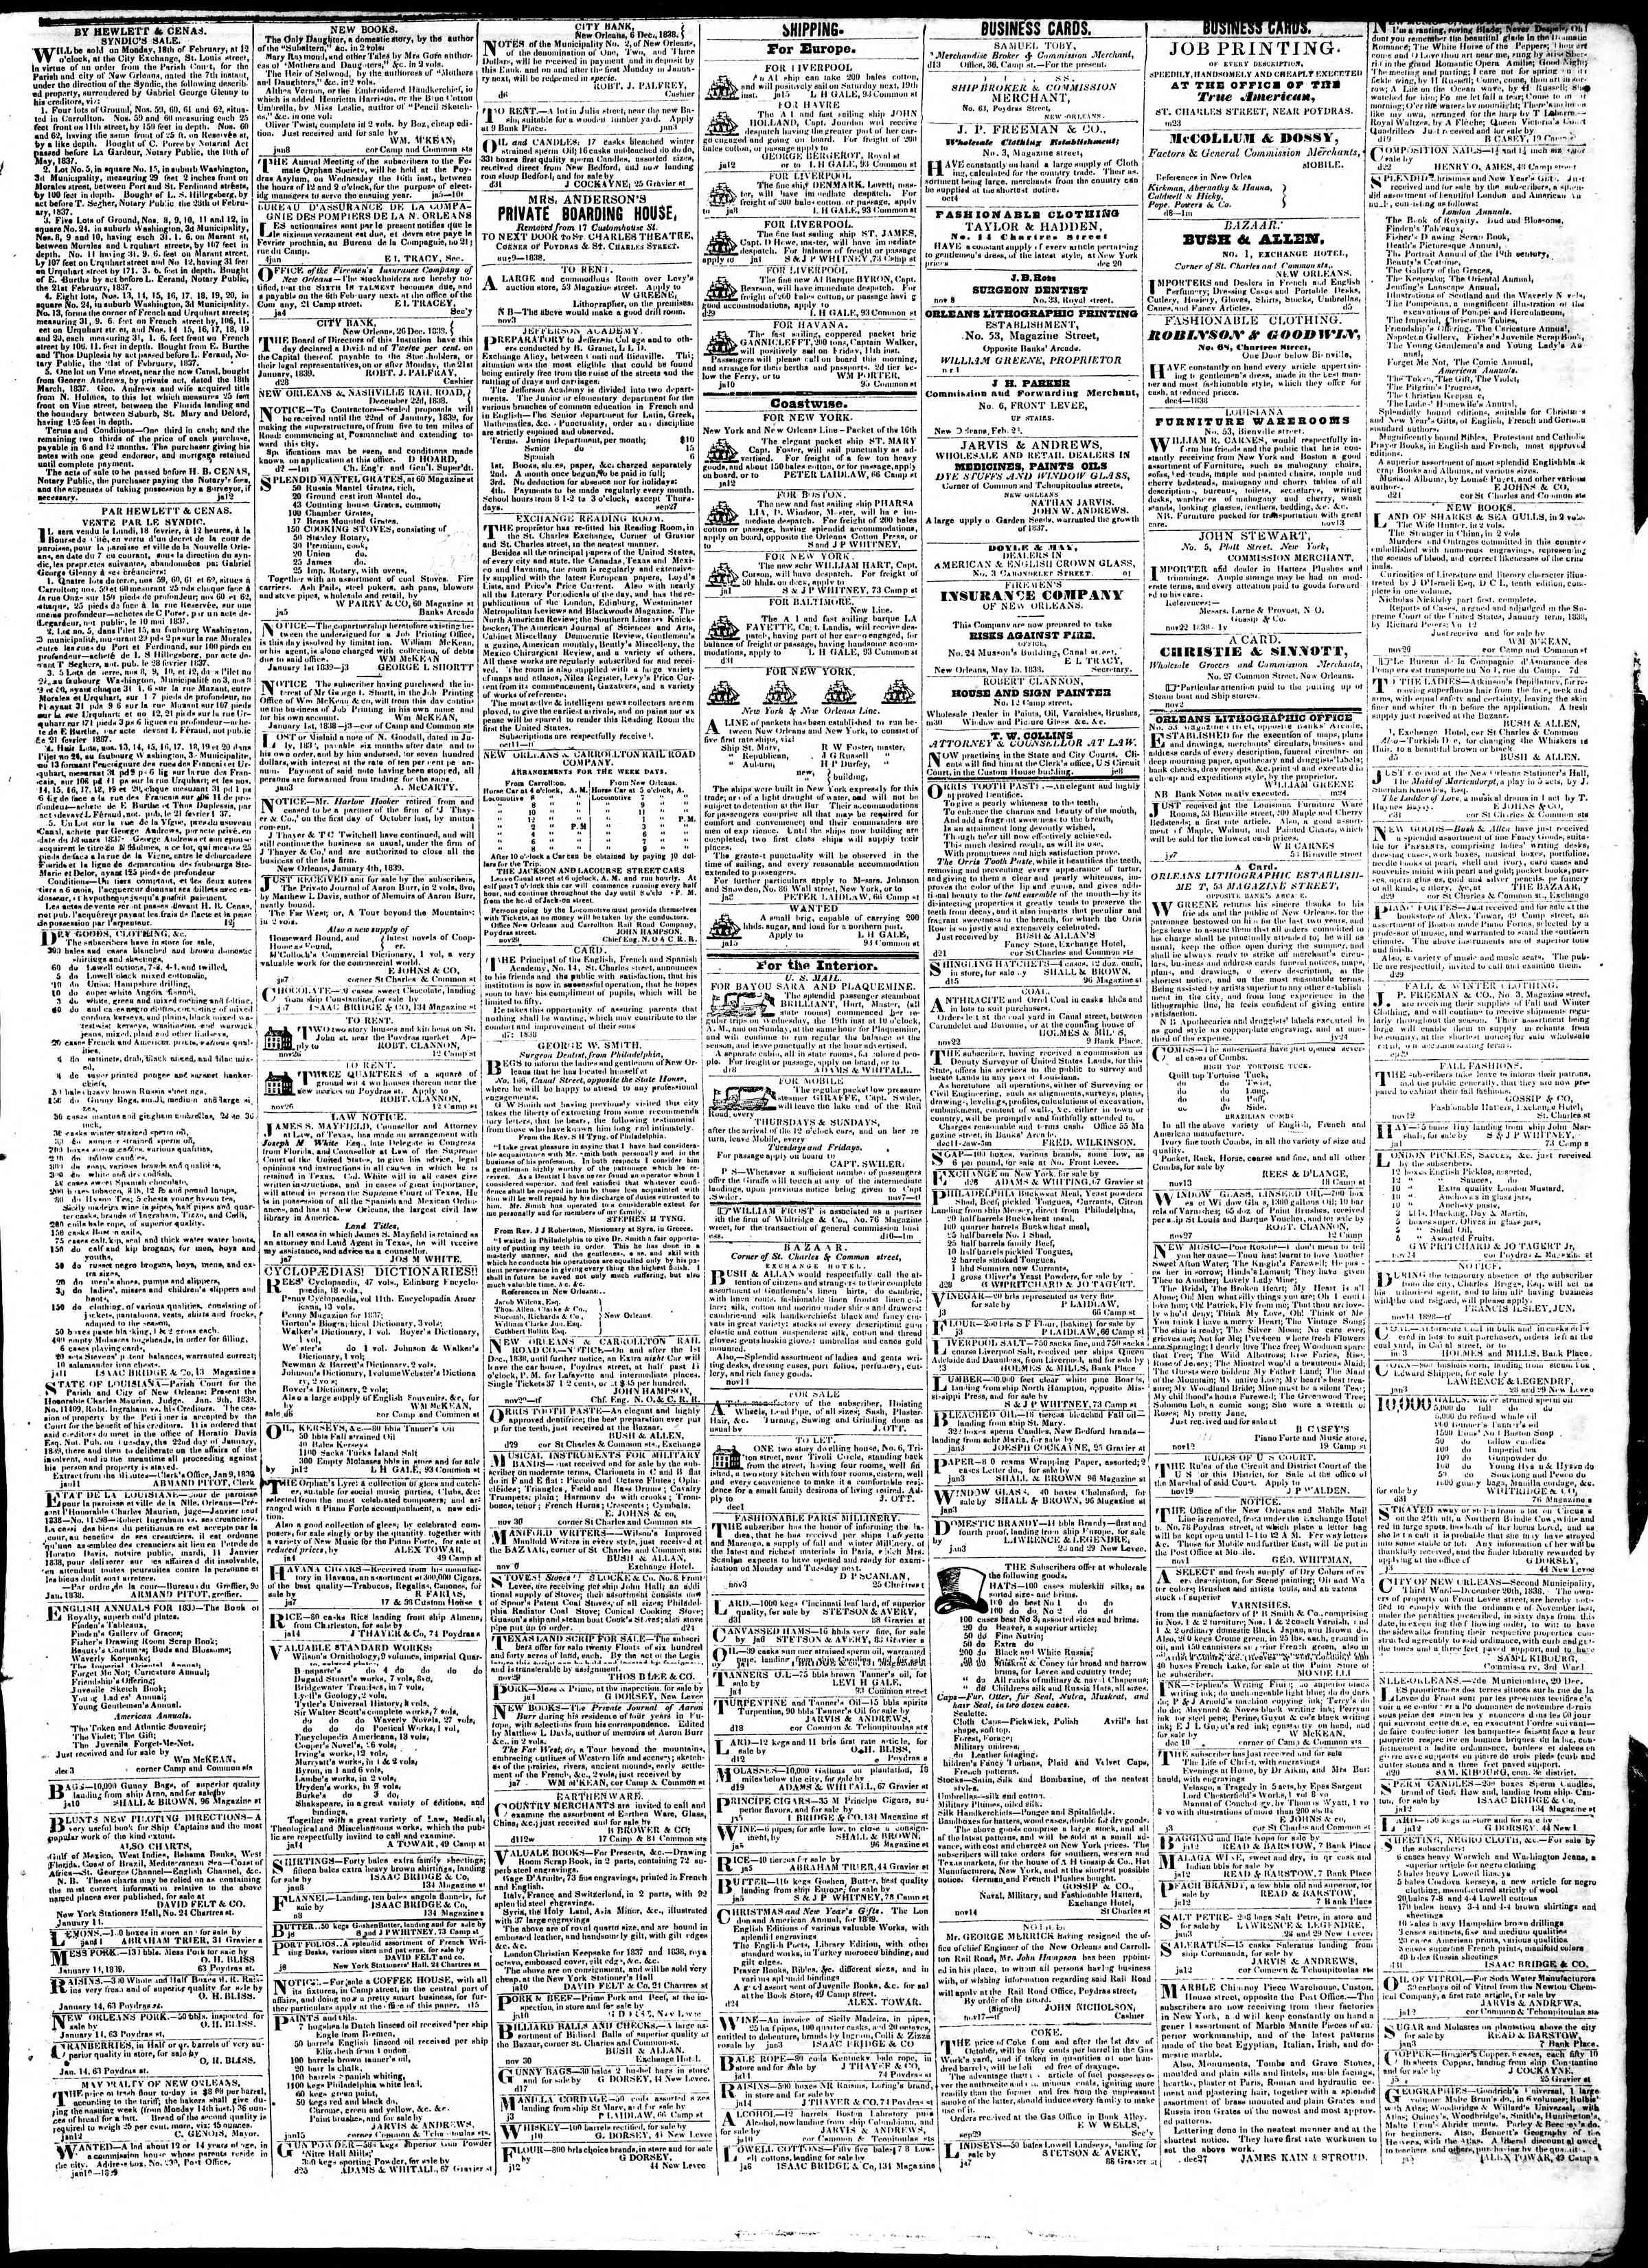 January 16, 1839 Tarihli True American Gazetesi Sayfa 3